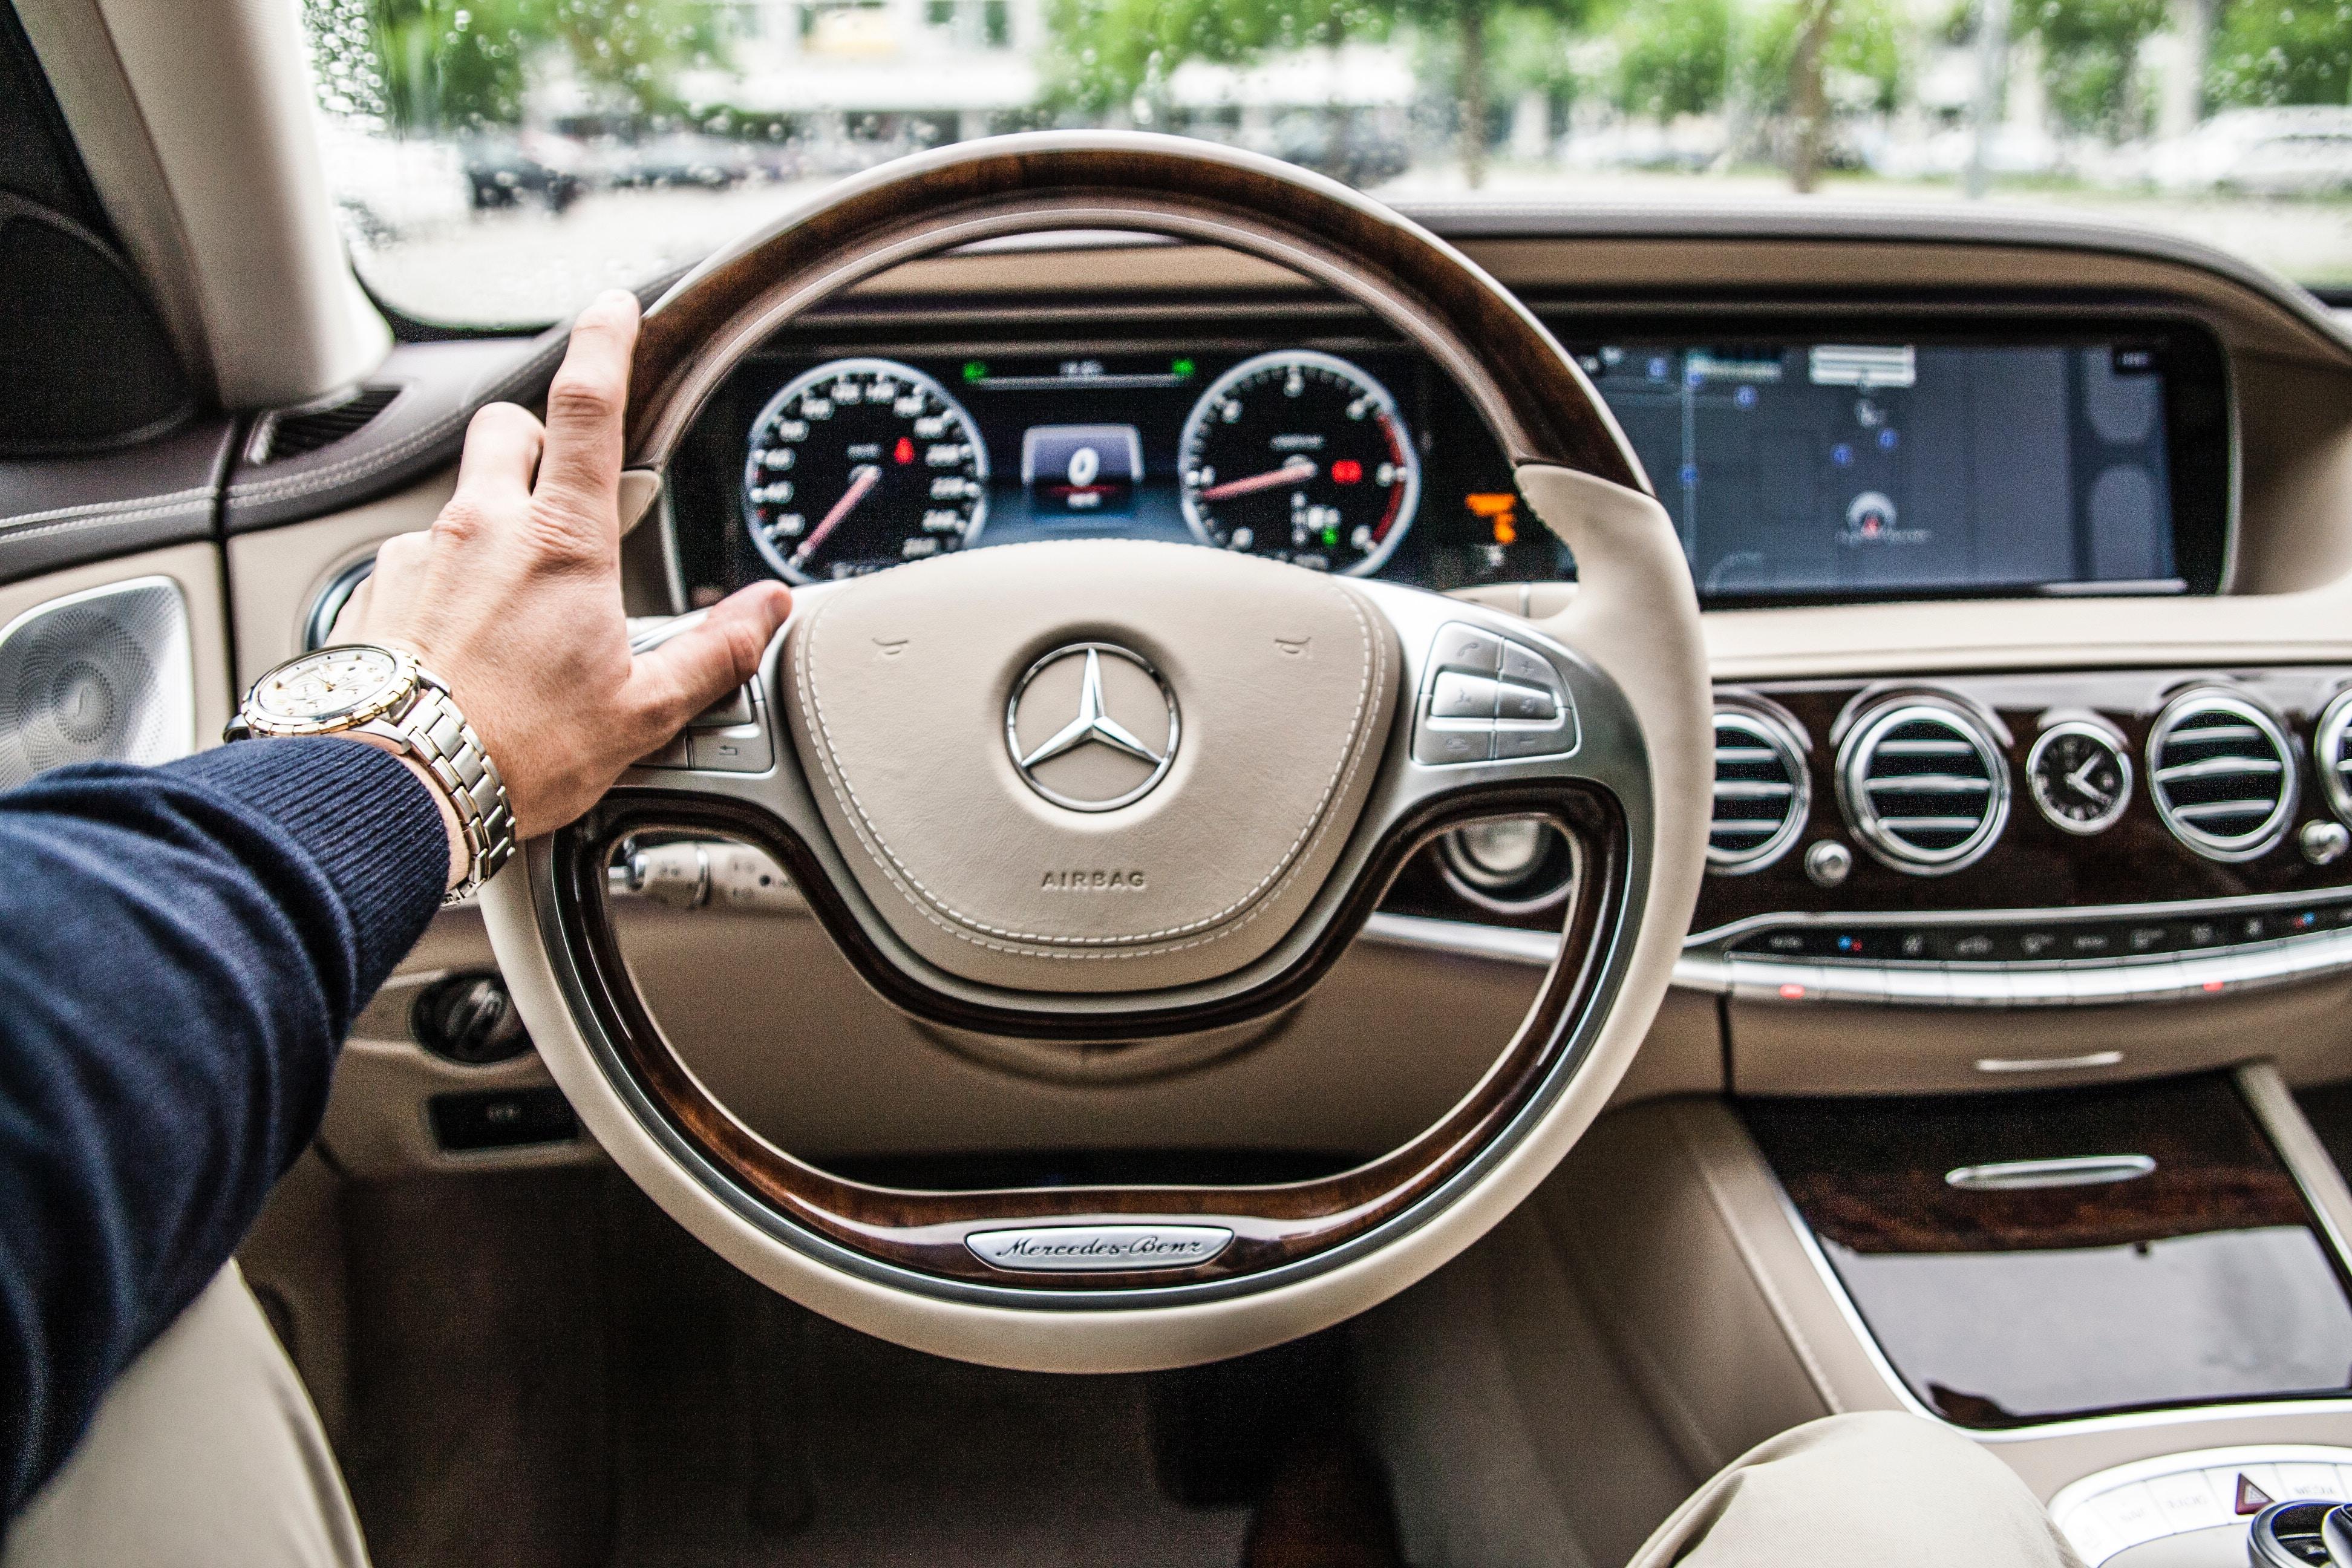 Mercedes Benz Service Repair and Maintenance • Leesburg VA